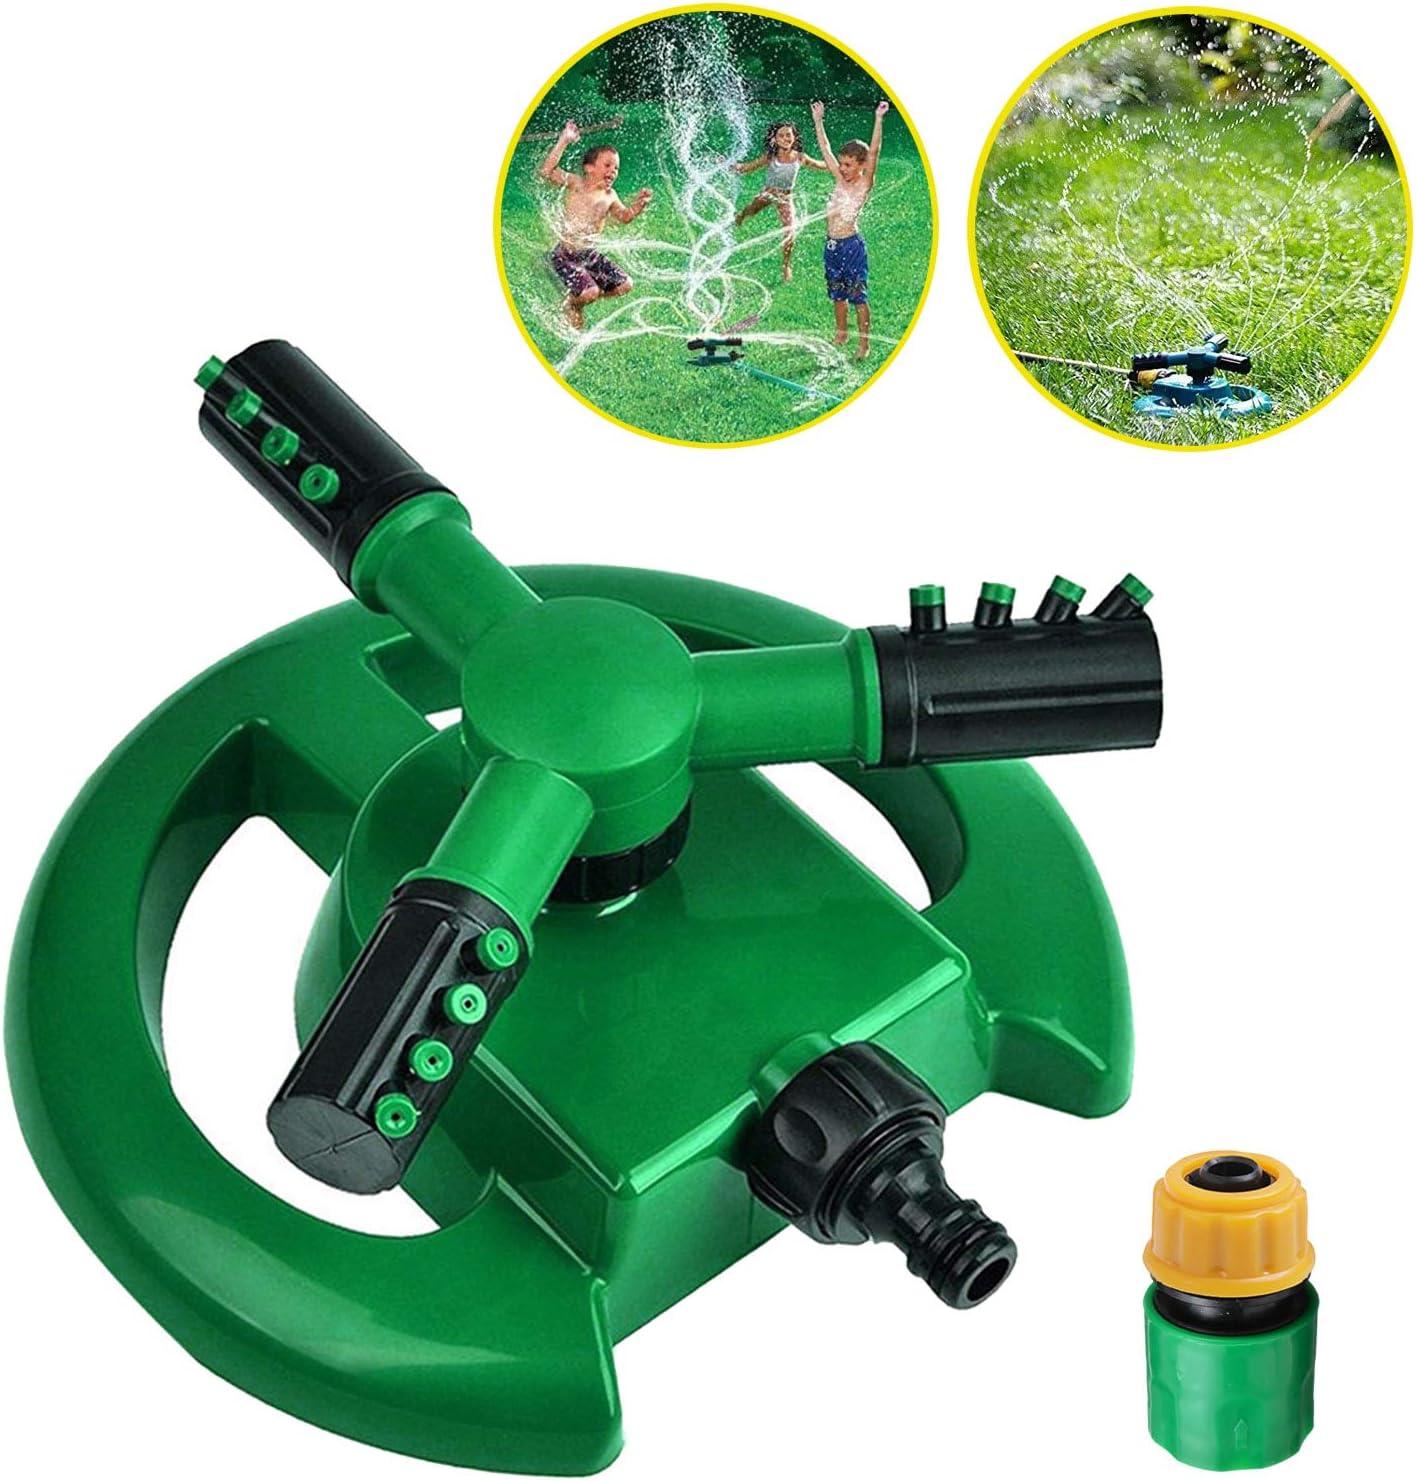 VALWORD Garden Sprinkler, 360 Degree Rotating Lawn Sprinkler Automatic Irrigation System 3600 Square Feet Coverage Oscillating Sprinkler for Garden Lawn Yard, Kids Playtime Outdoor : Garden & Outdoor